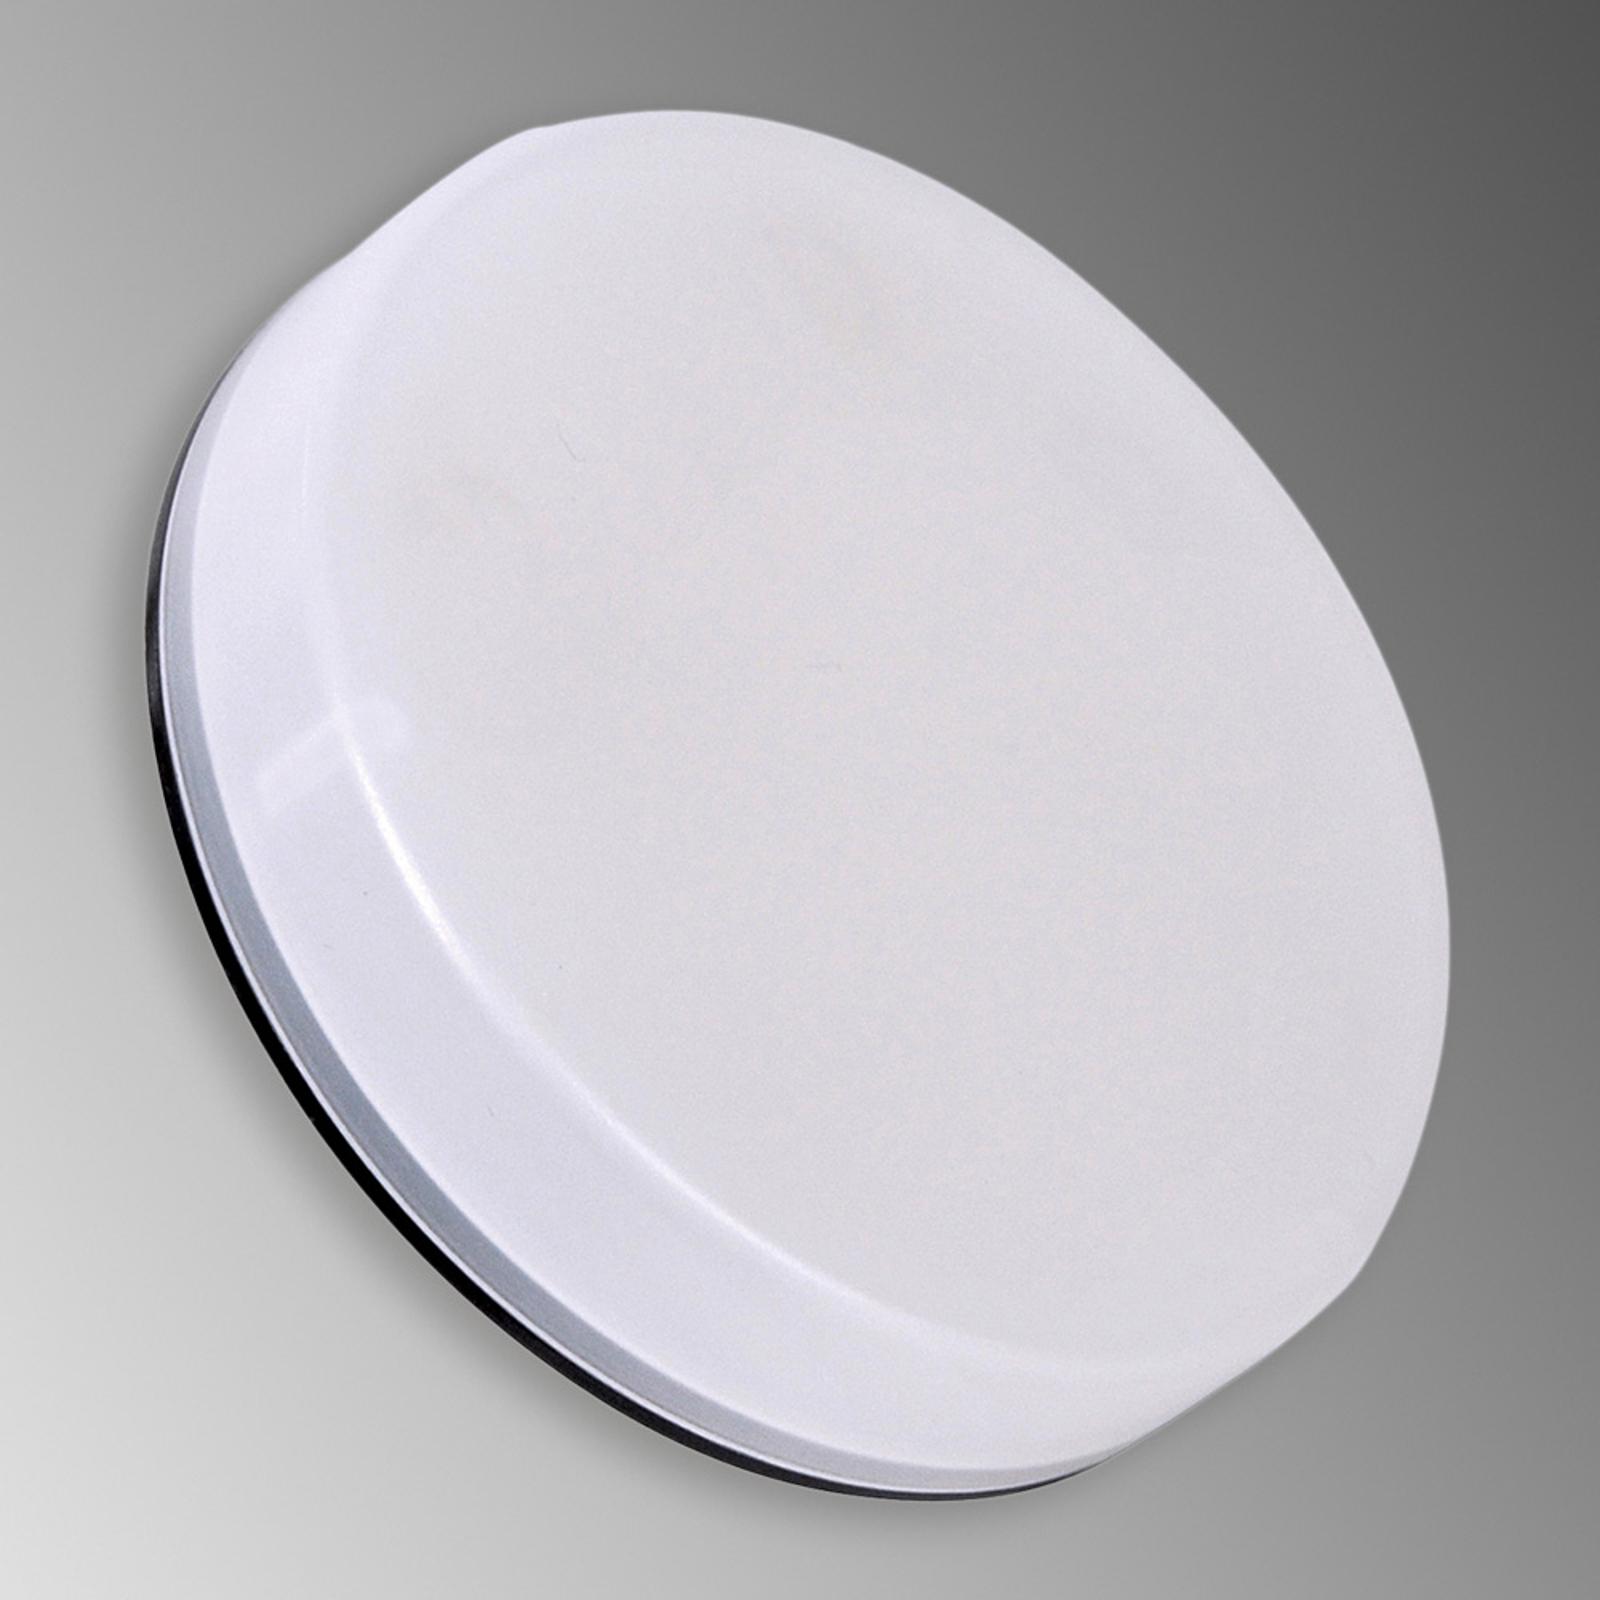 LED-pære MicroLynx GX53 5W 470lm frost 3000K